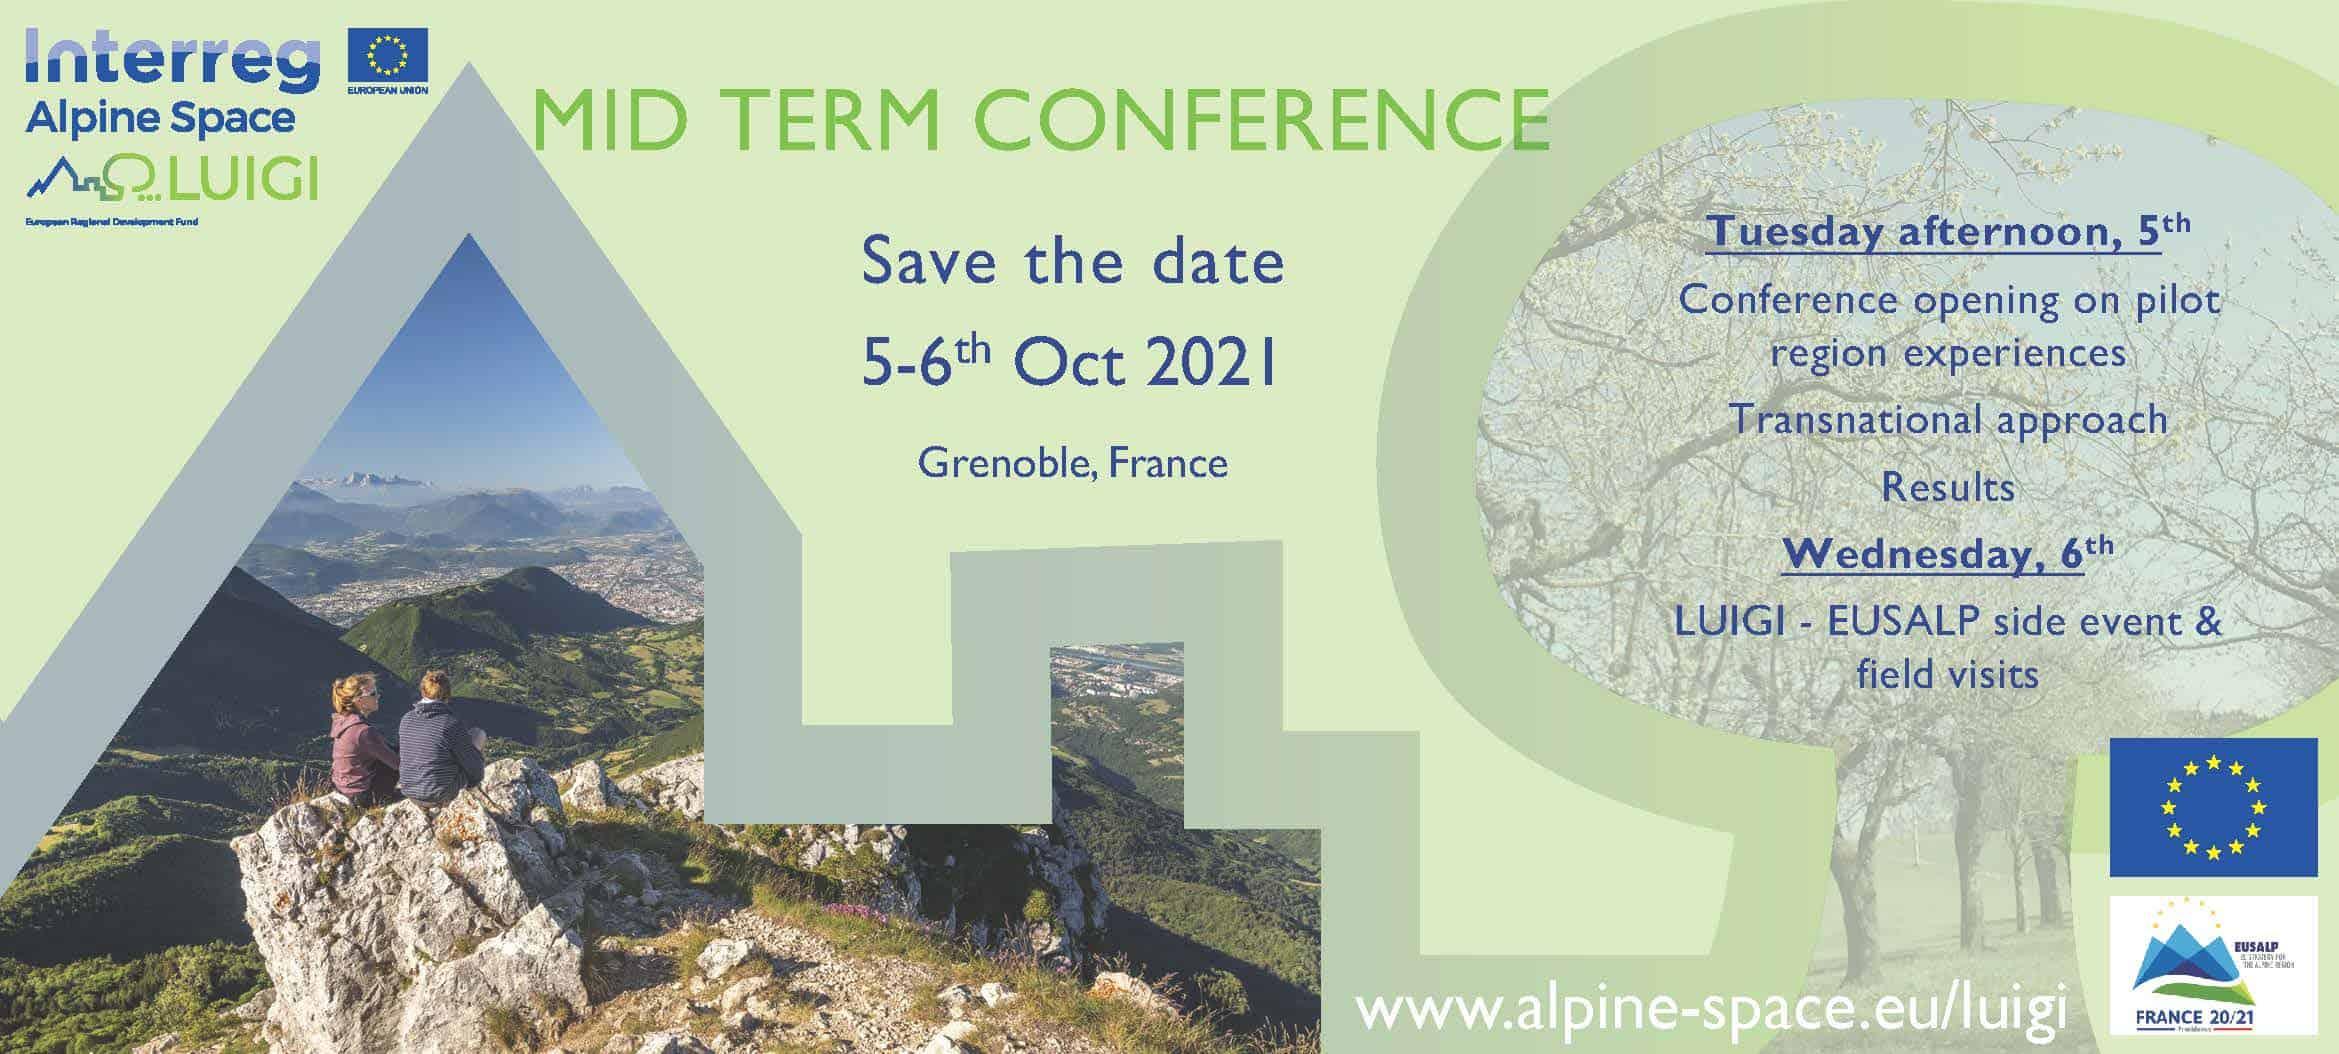 luigi_banner_grenoble_mid-term-conference